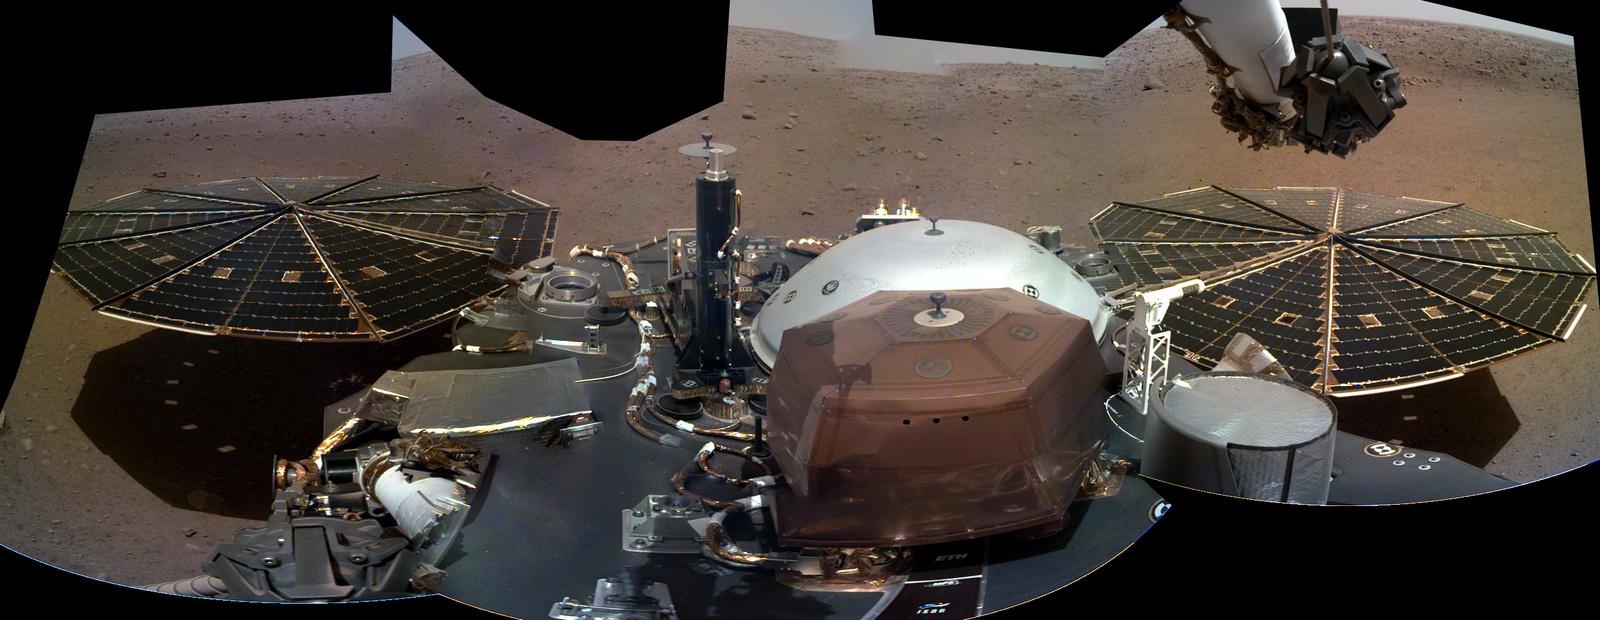 panorama_insight_ver01_Limax7.thumb.jpg.d8939bd87c45fde1d552cb7b1e904178.jpg